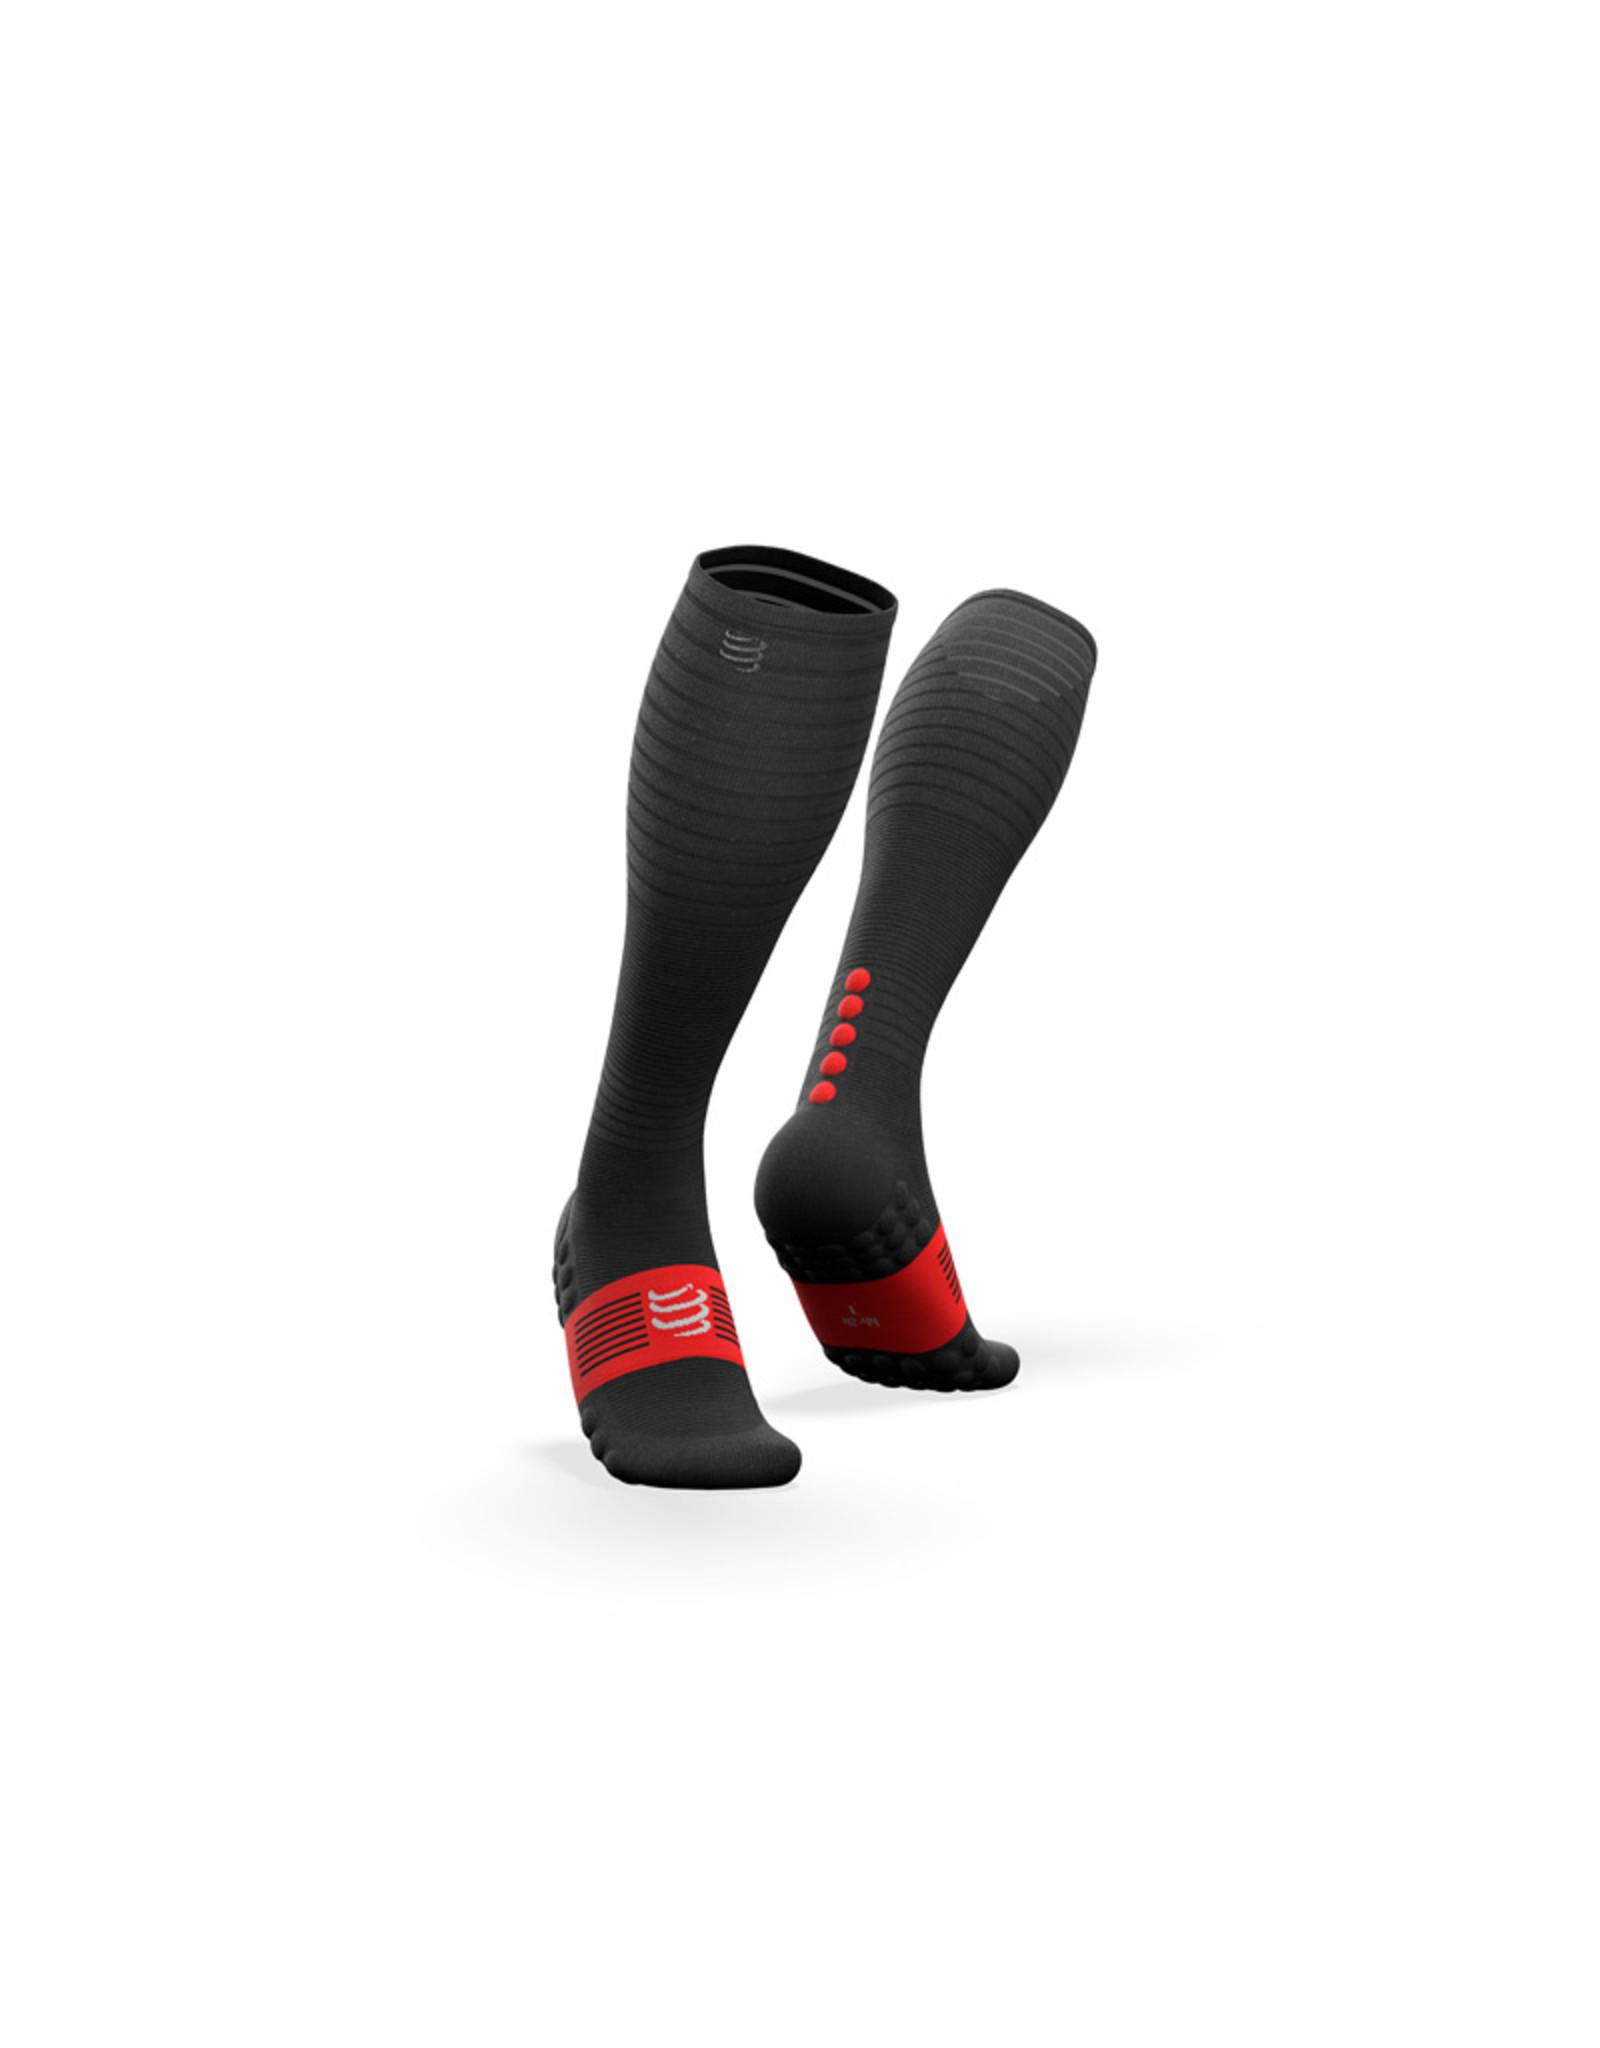 Compressport Full Socks Oxygen Chaussettes De Compression - Noir